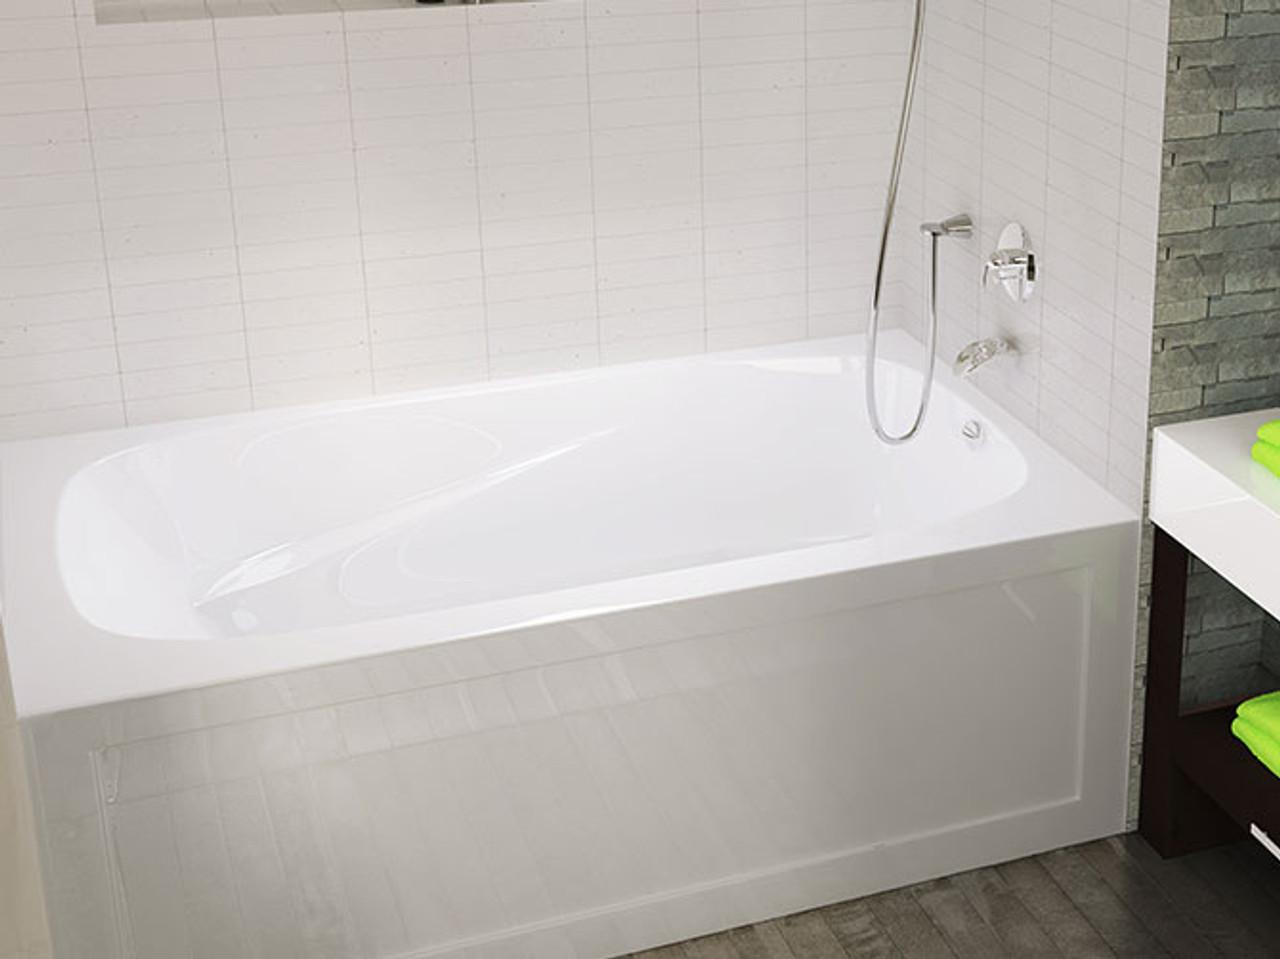 "mirolin phoenix 60"" x 30"" skirted right hand bath tub - york taps"